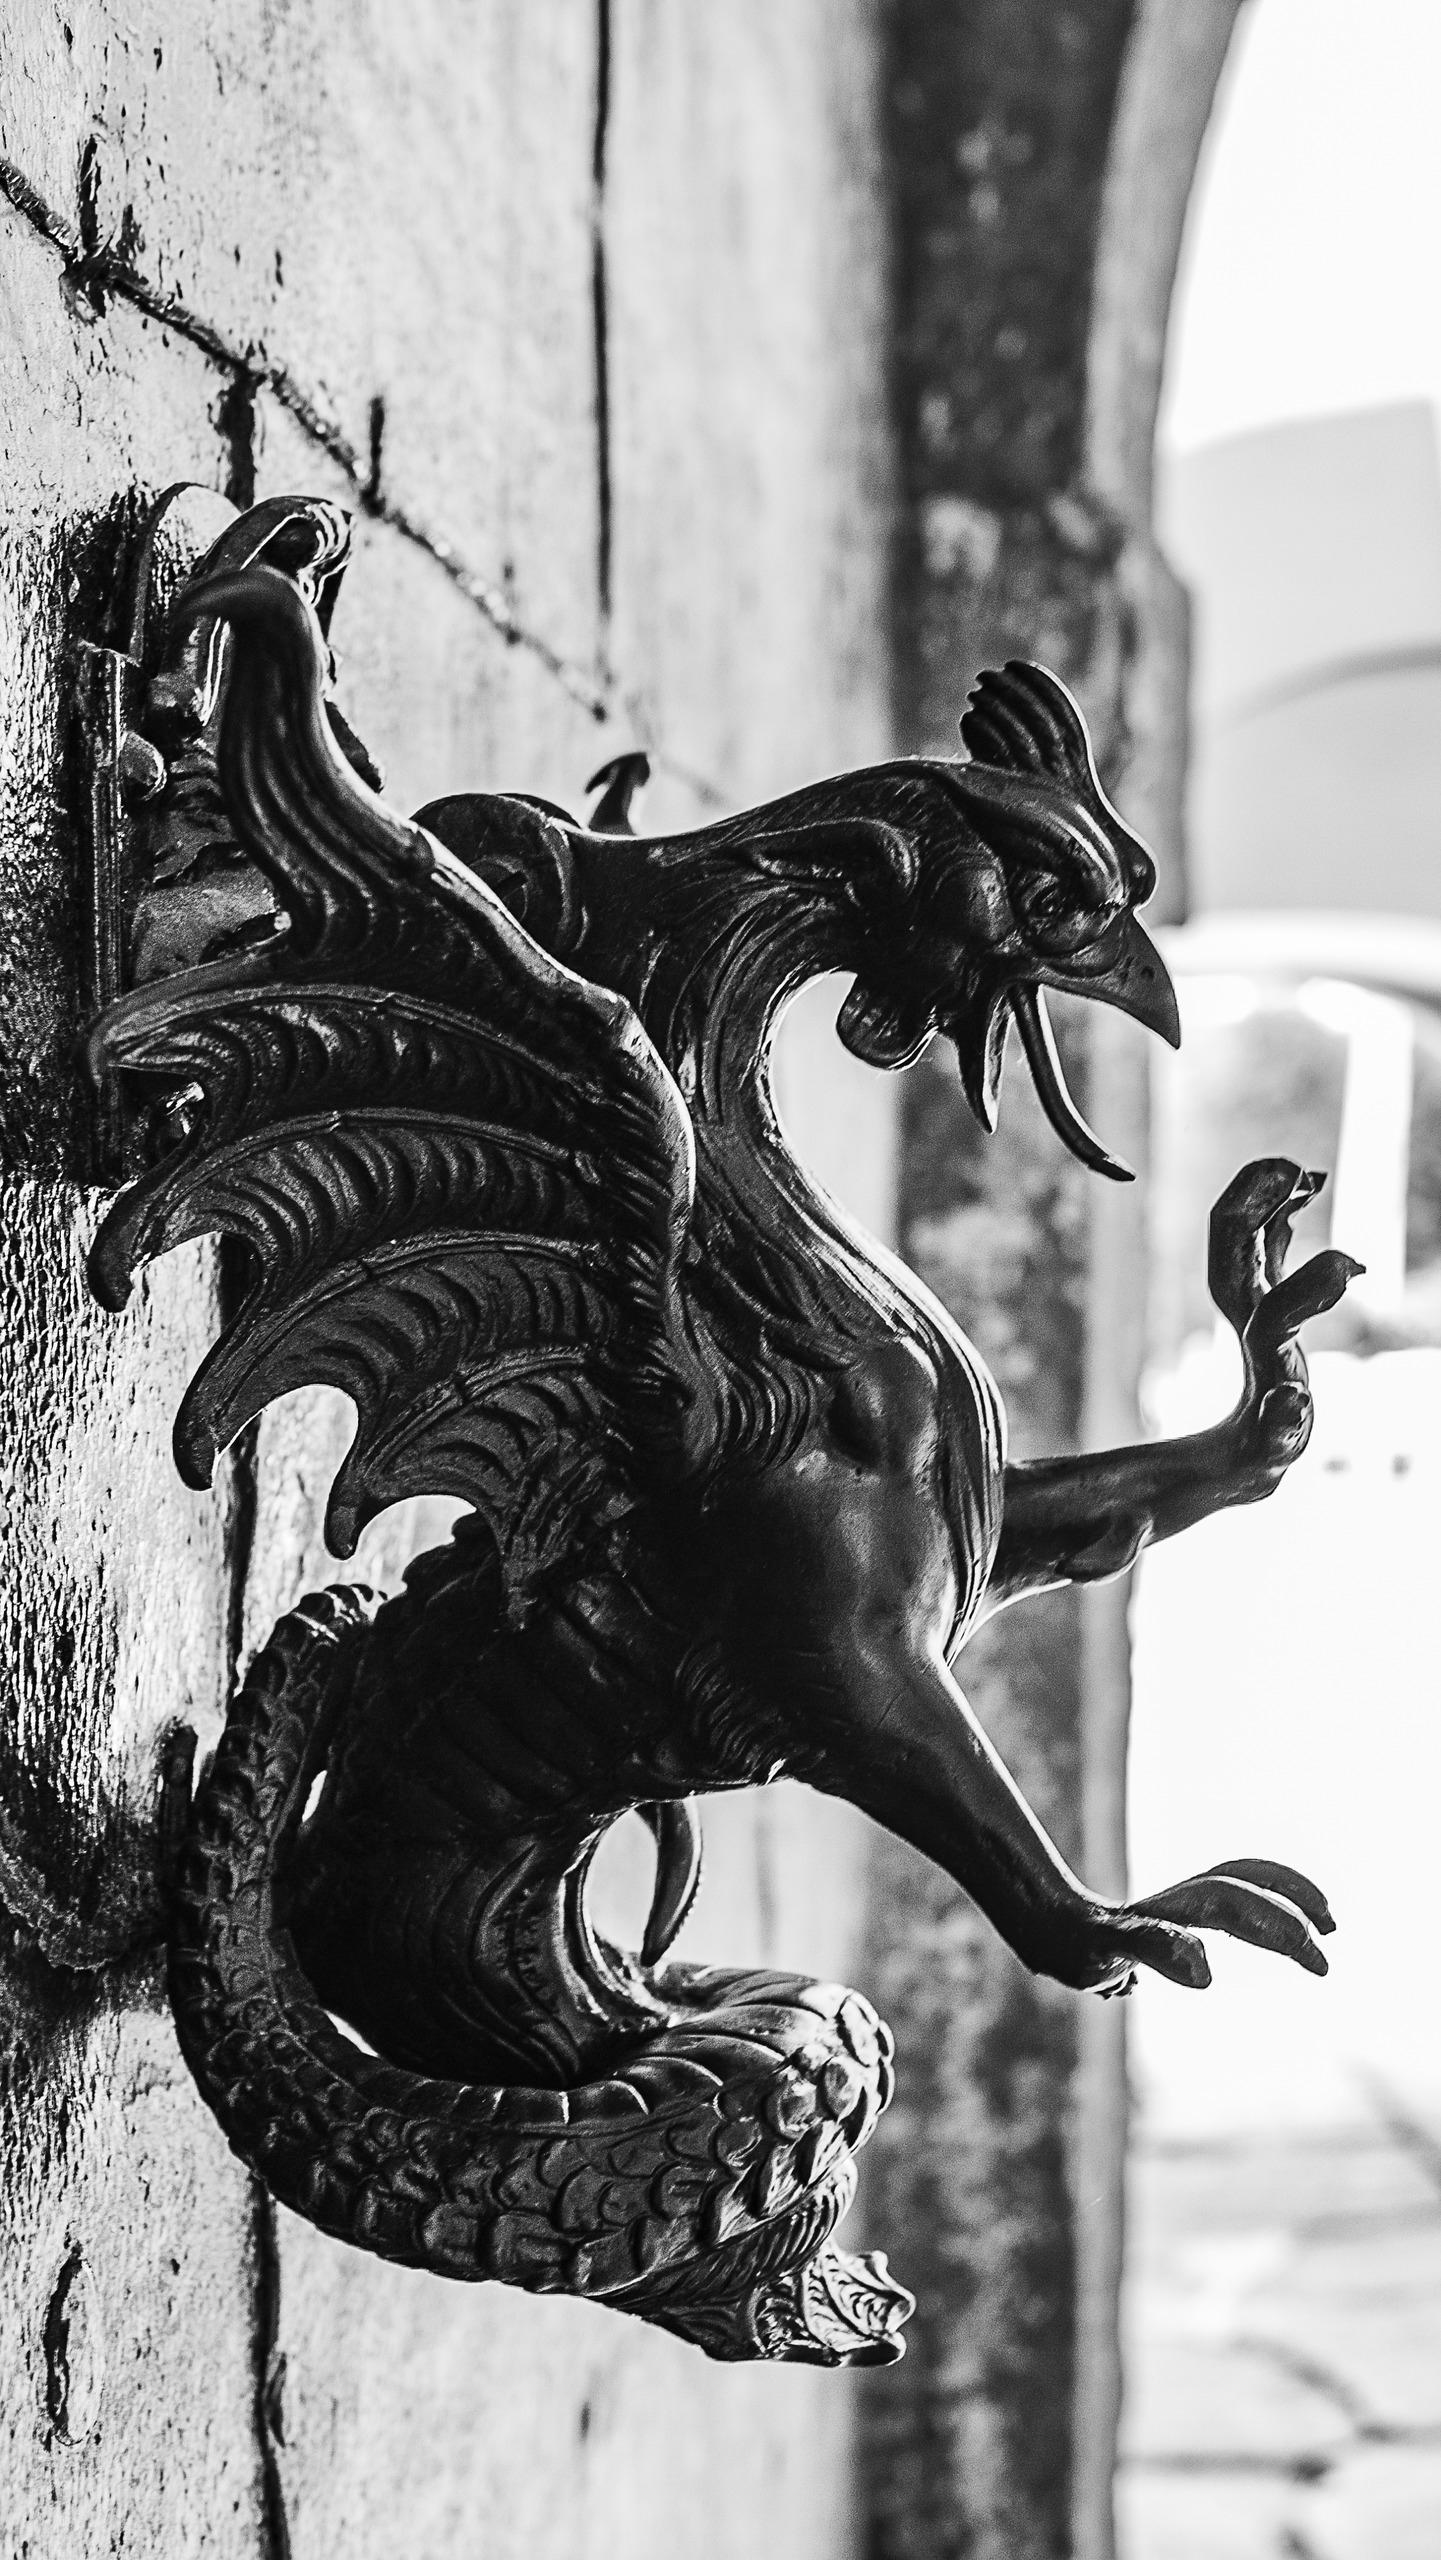 Schloss Kornberg Drache der Bur - marcstipsits | ello